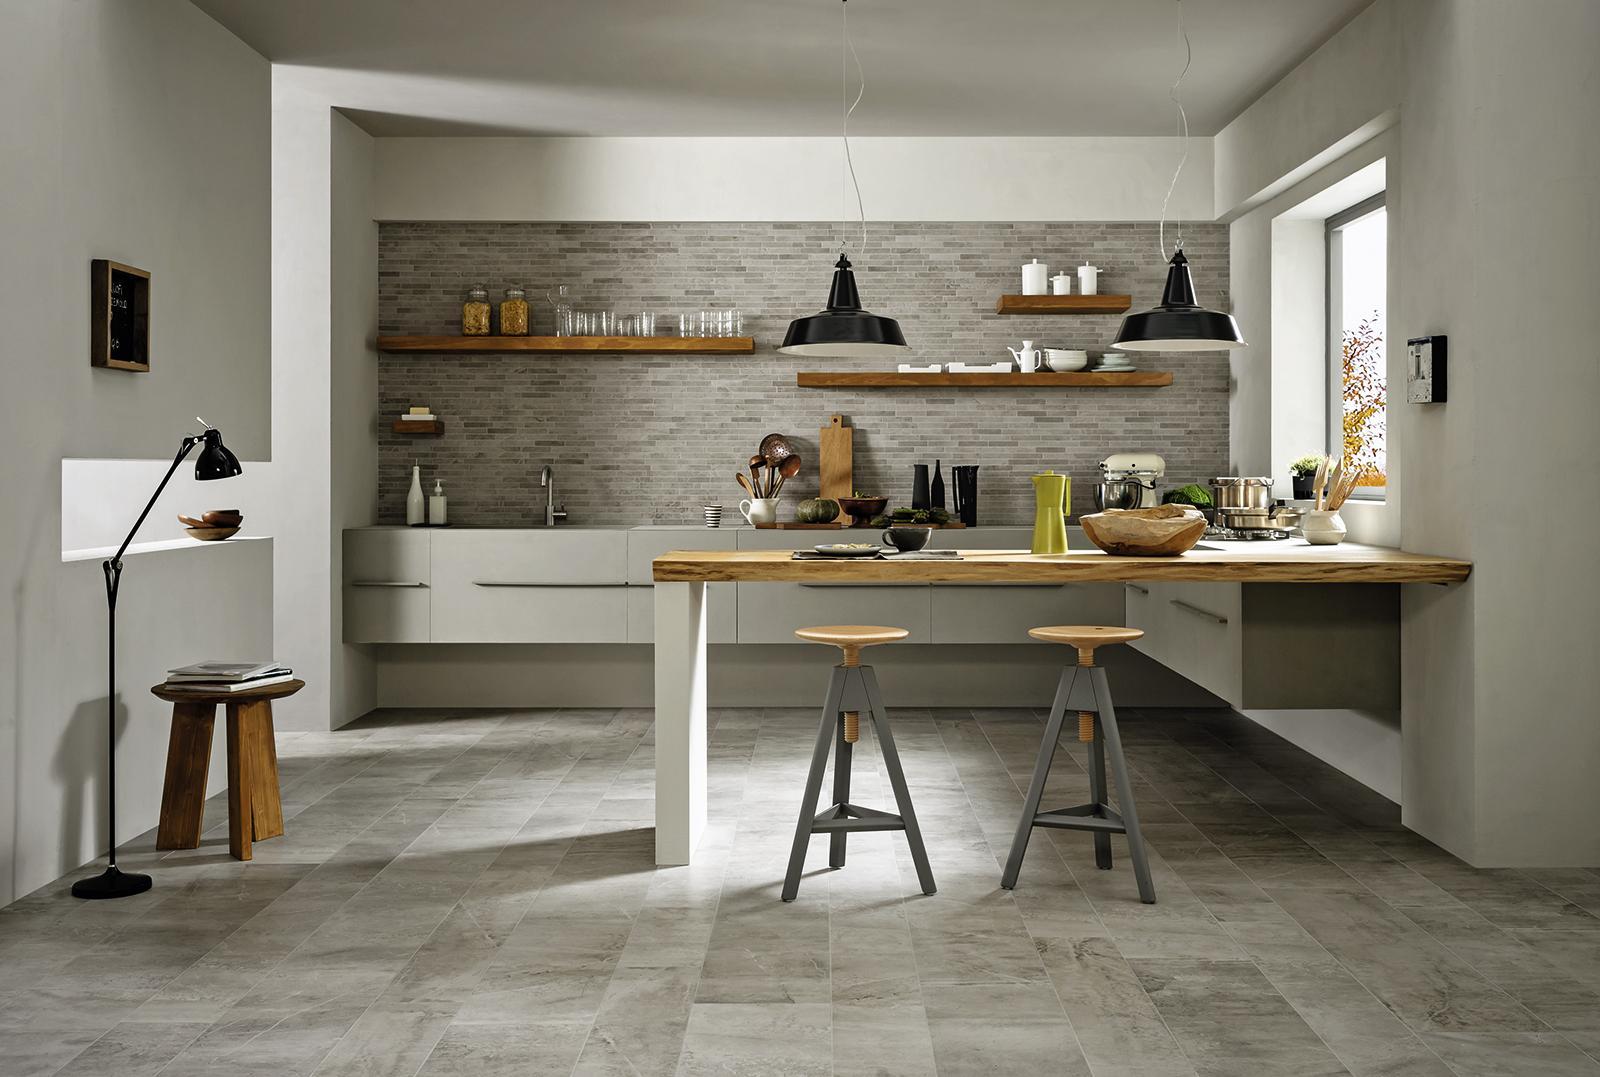 Pavimento cucina effetto pietra cucina effetto pietra gallery of